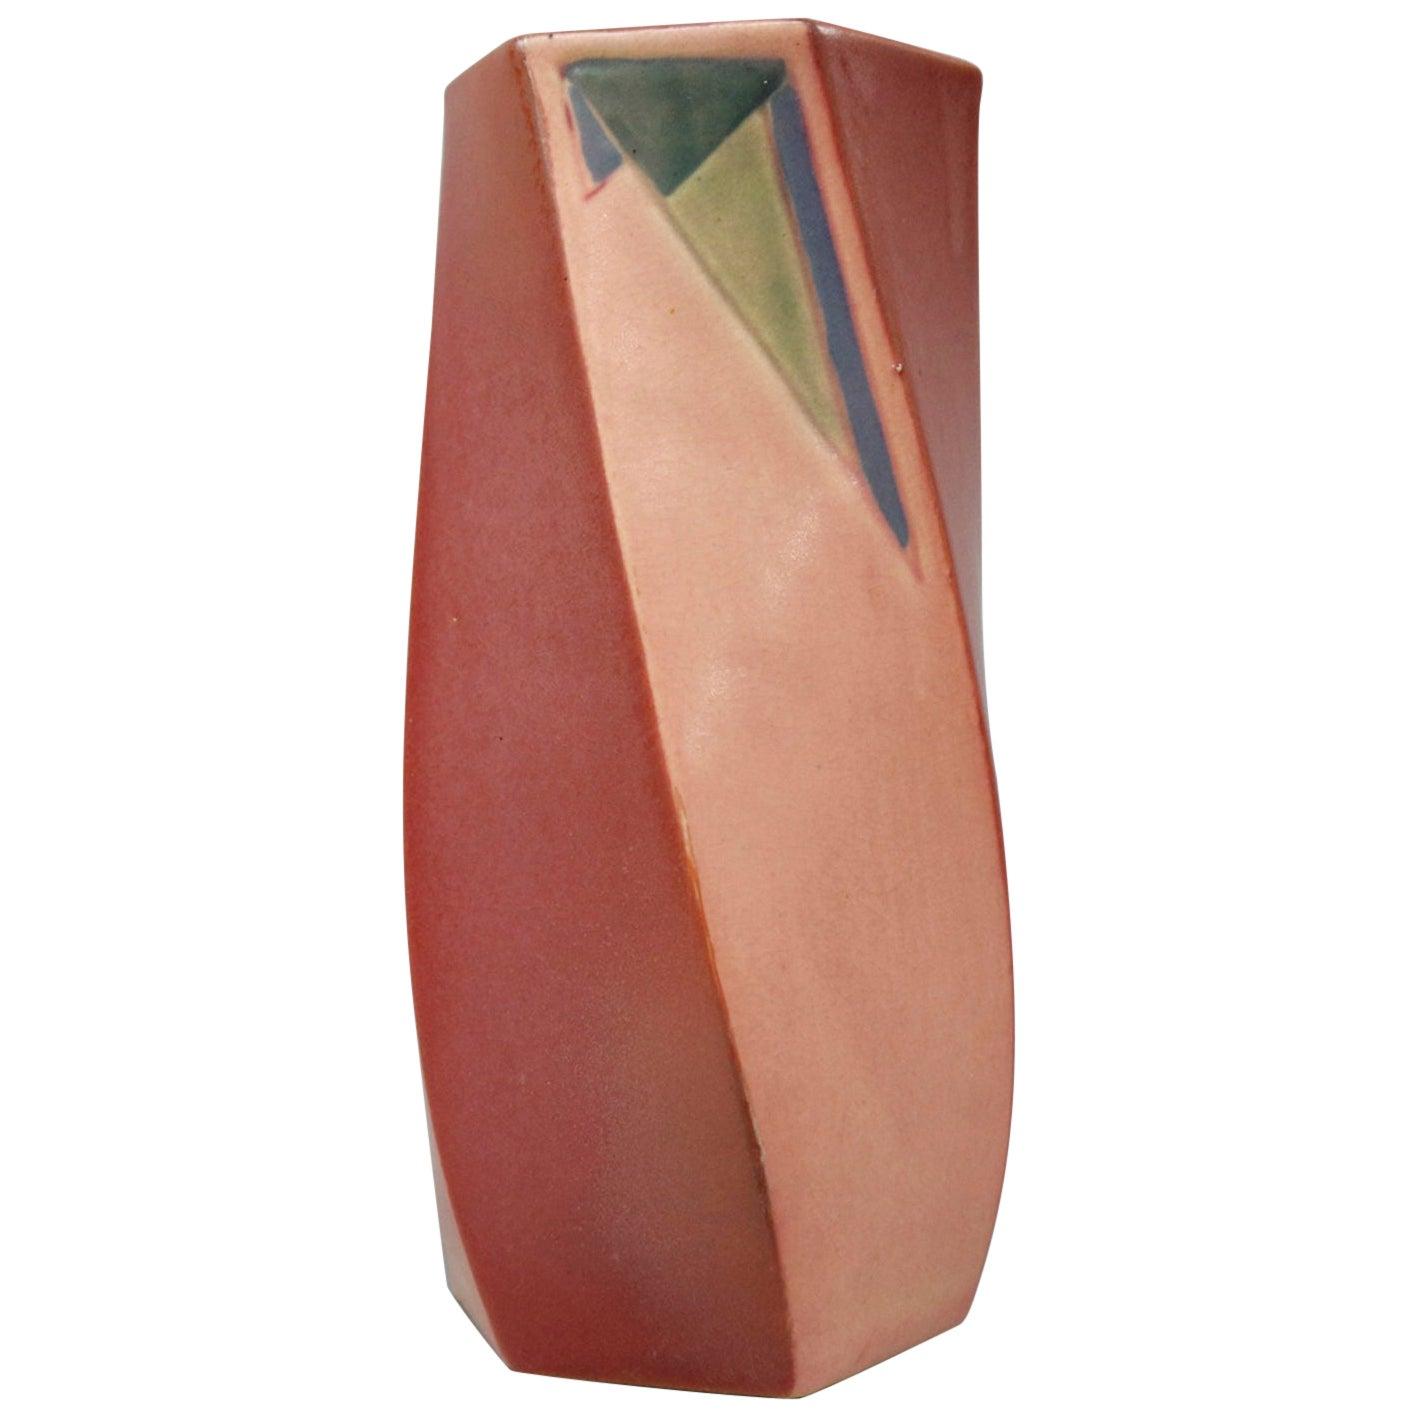 Antique Roseville Futura Art Deco Twisted Art Pottery Vase, circa 1920